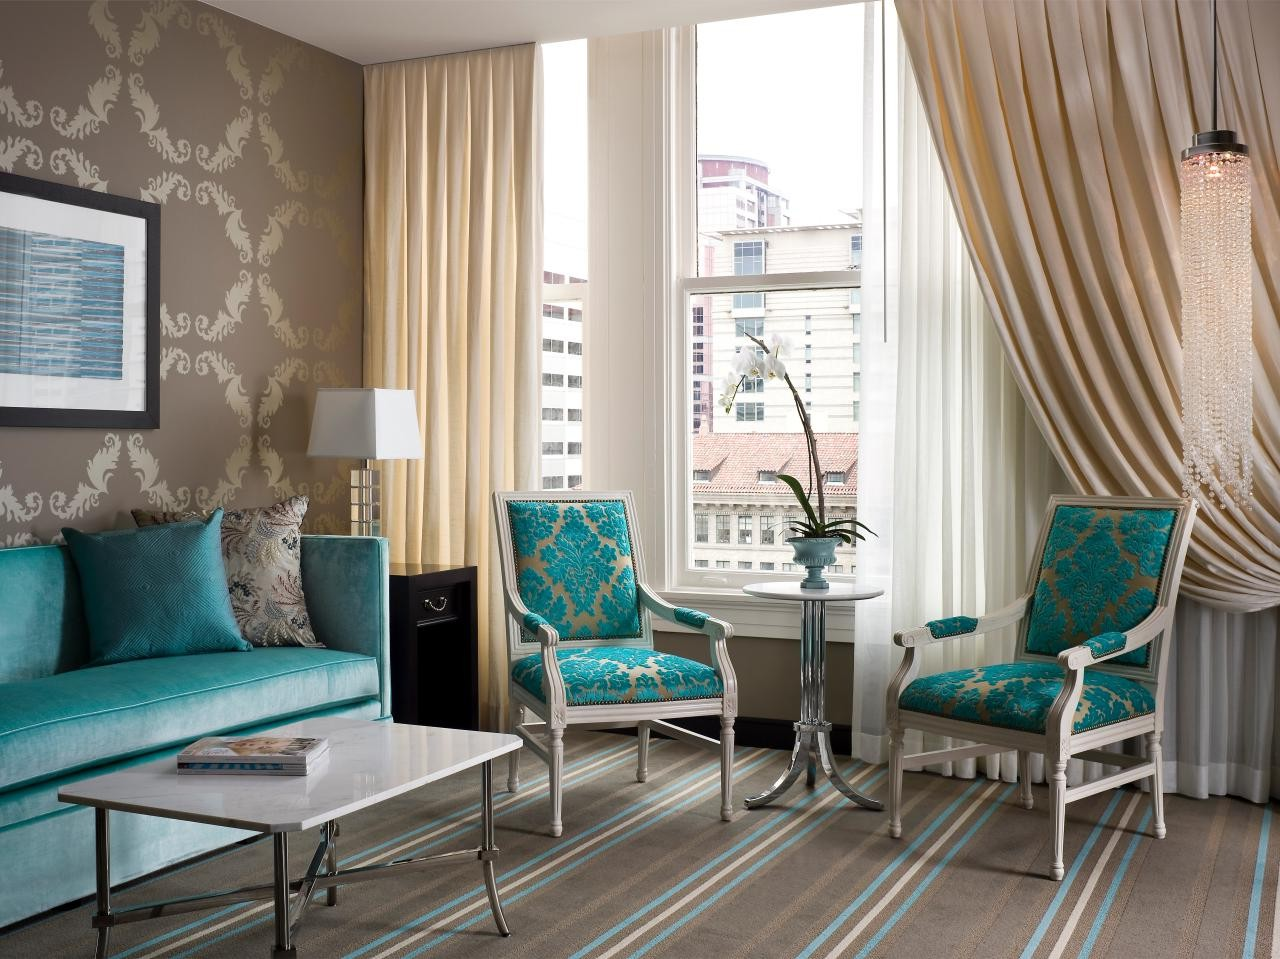 Elegant vardagsrum med turkosa accentstolar